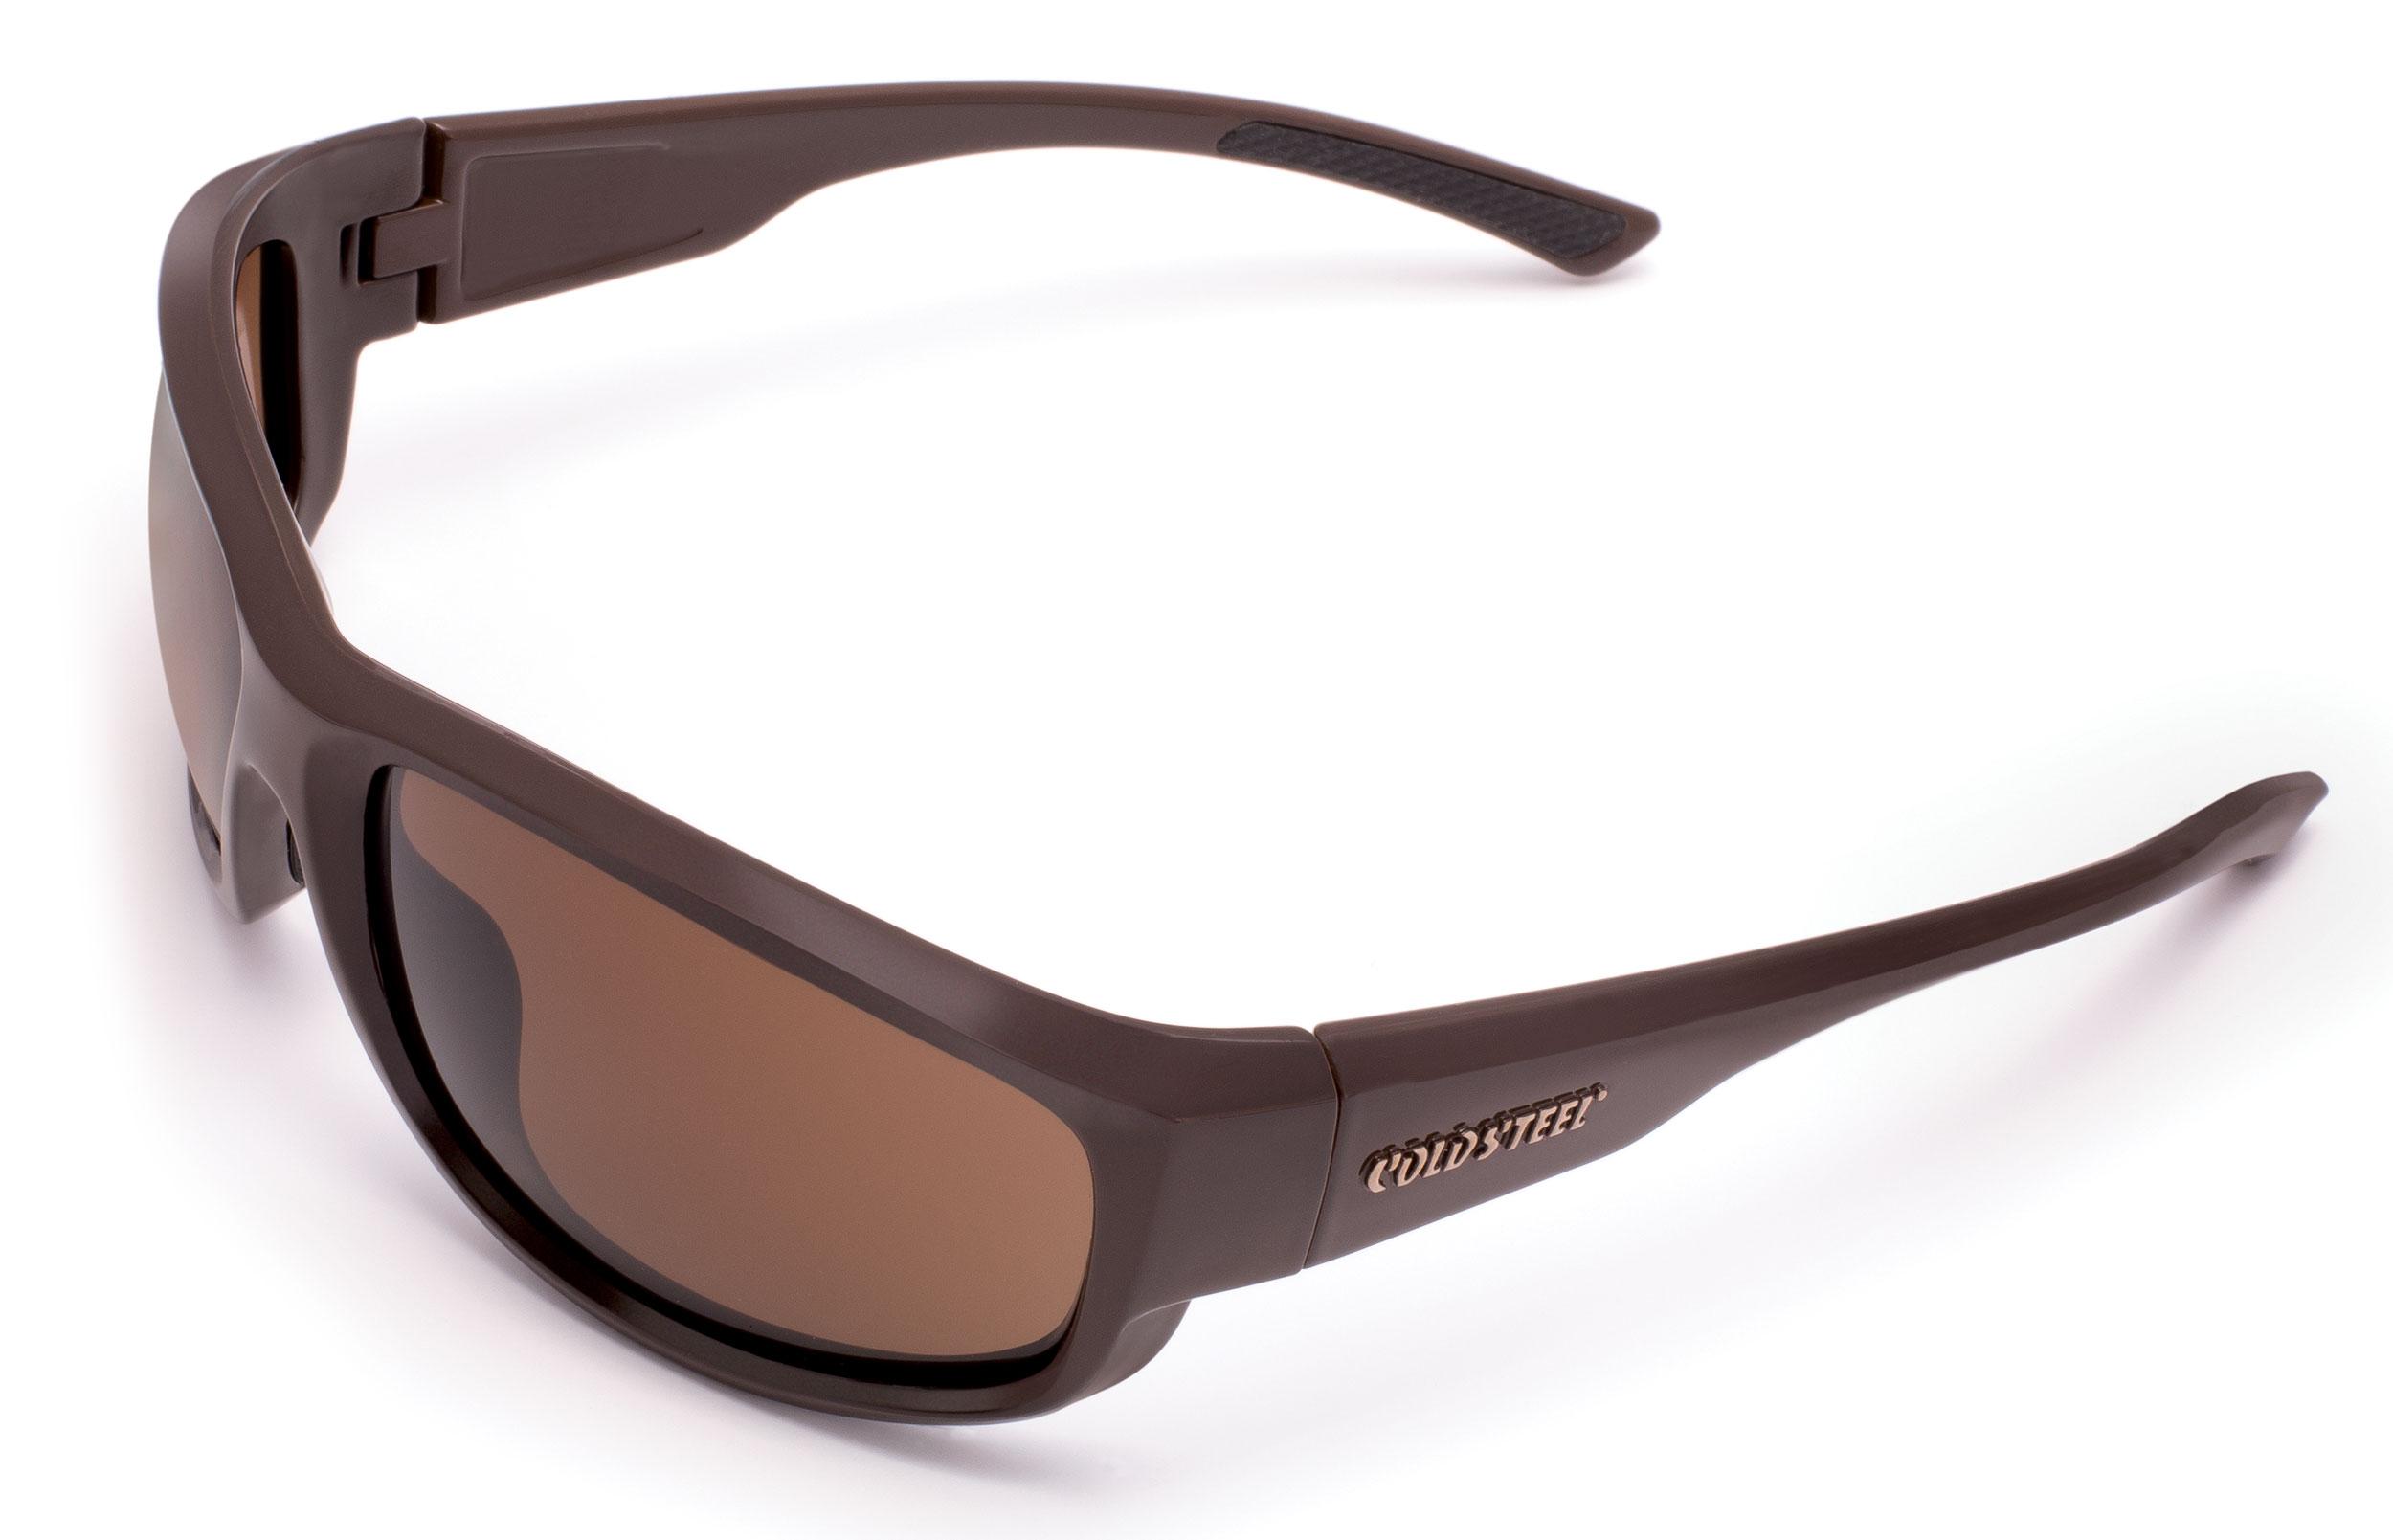 Cold Steel EW23M Battle Shades Mark-II Eyewear, Matte Brown Sunglasses